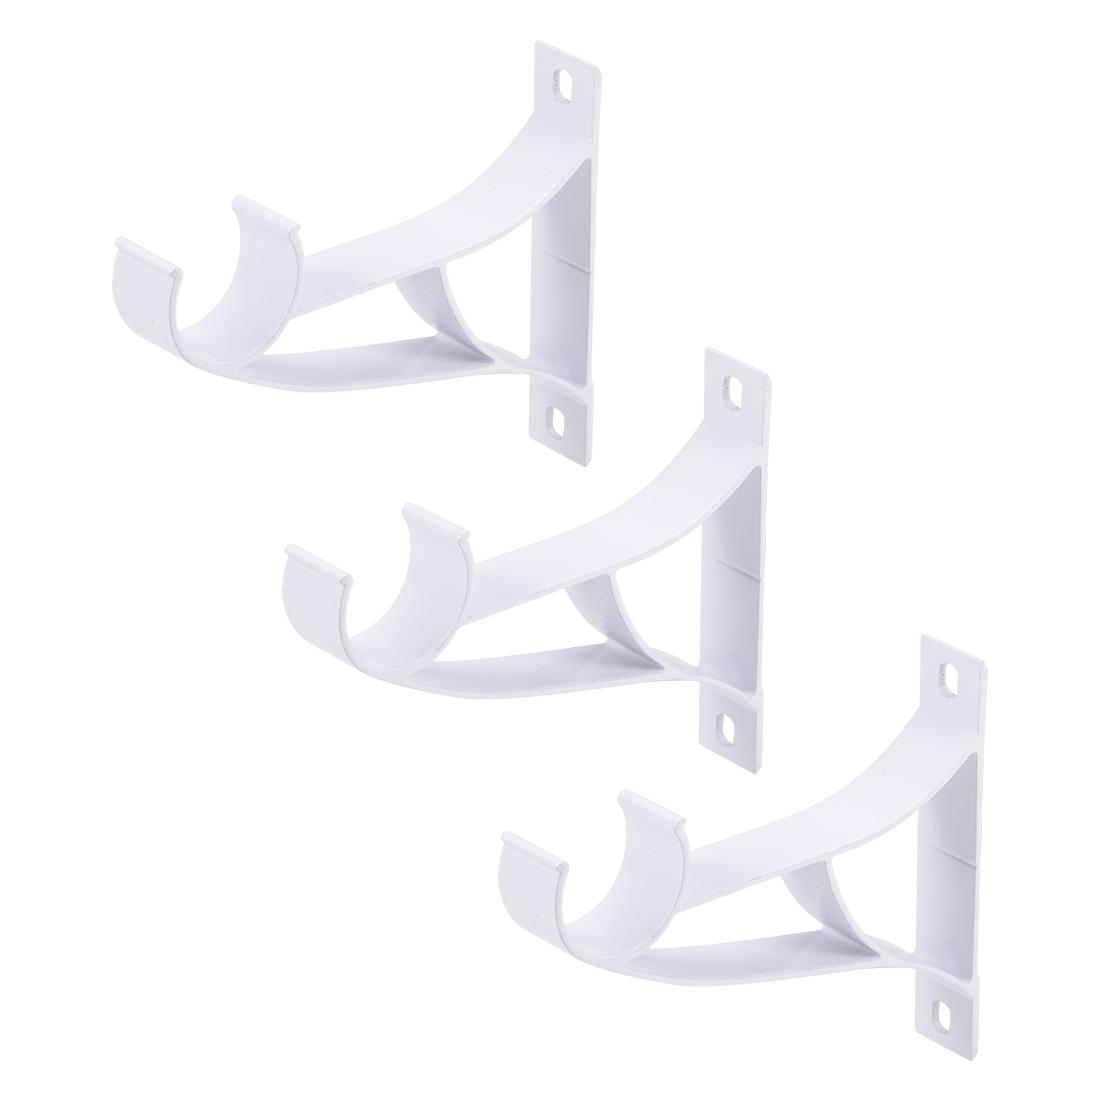 Curtain Rod Bracket Single Holder for 25mm Rod, 94 x 80 x 16mm White 3 Pcs